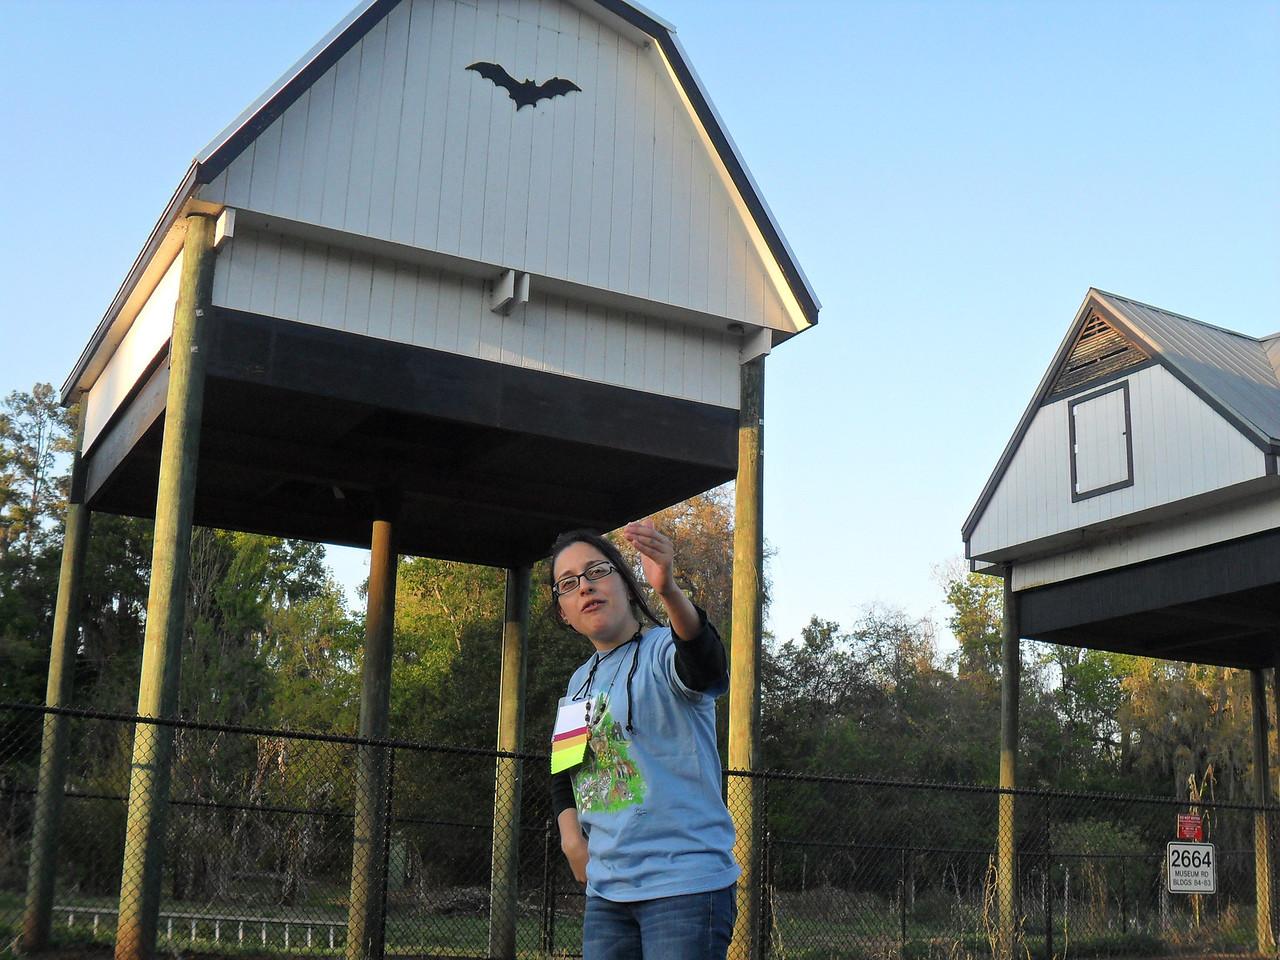 Bat House - Friday night